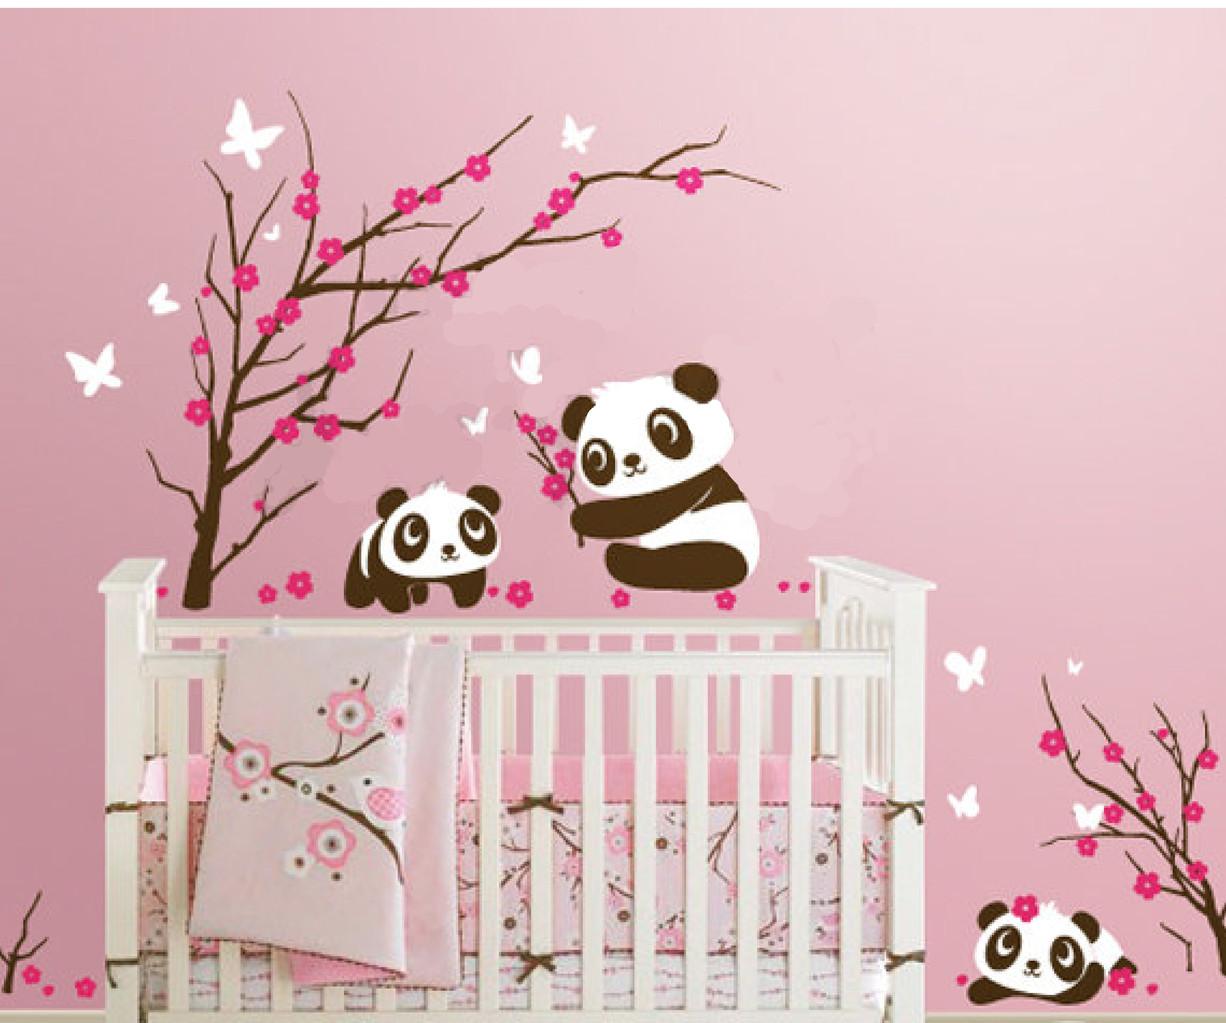 6 Panda In Cherry Blossom Leafy Dreams Nursery Decals